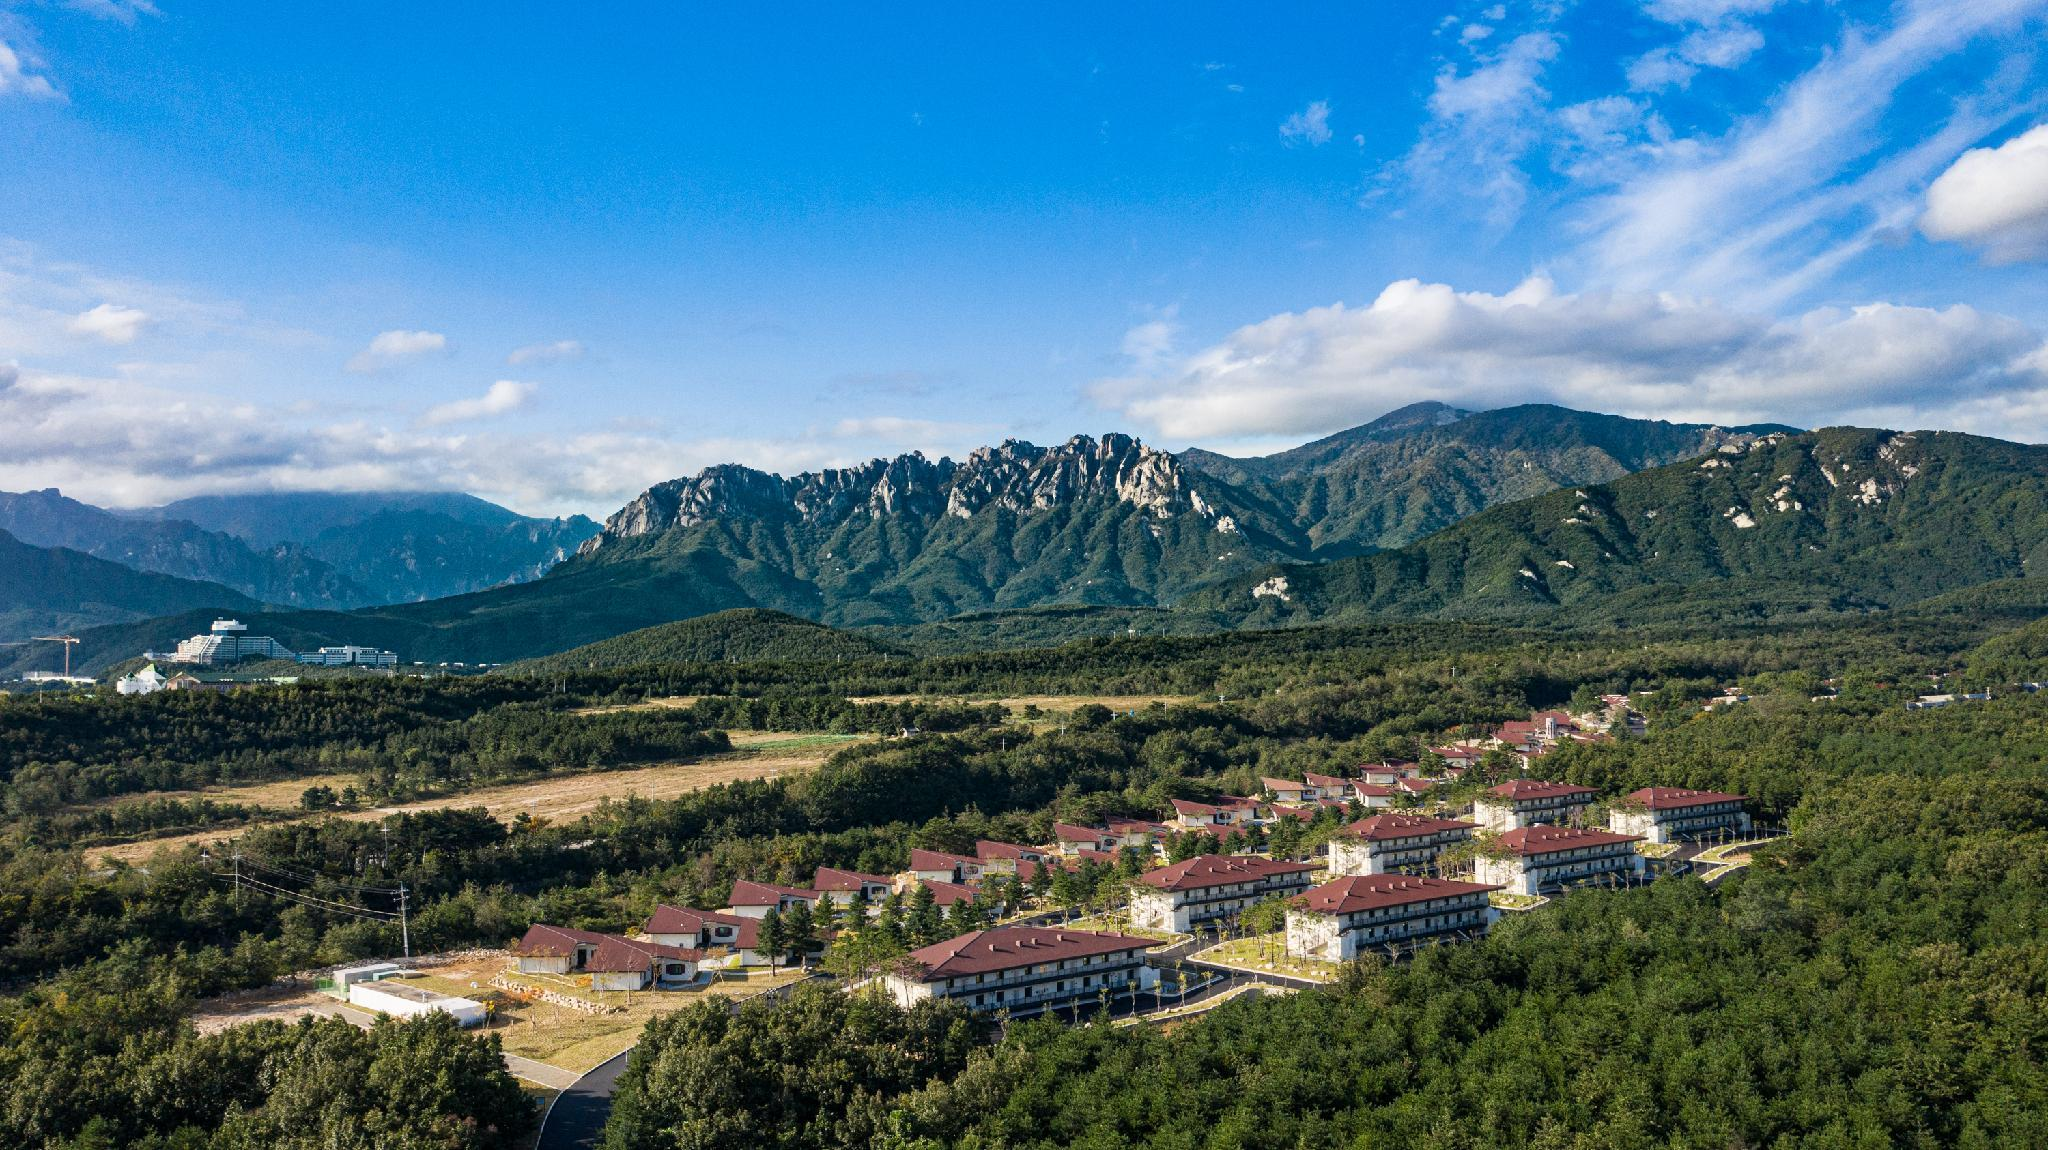 Kensington Resort Seorak Valley